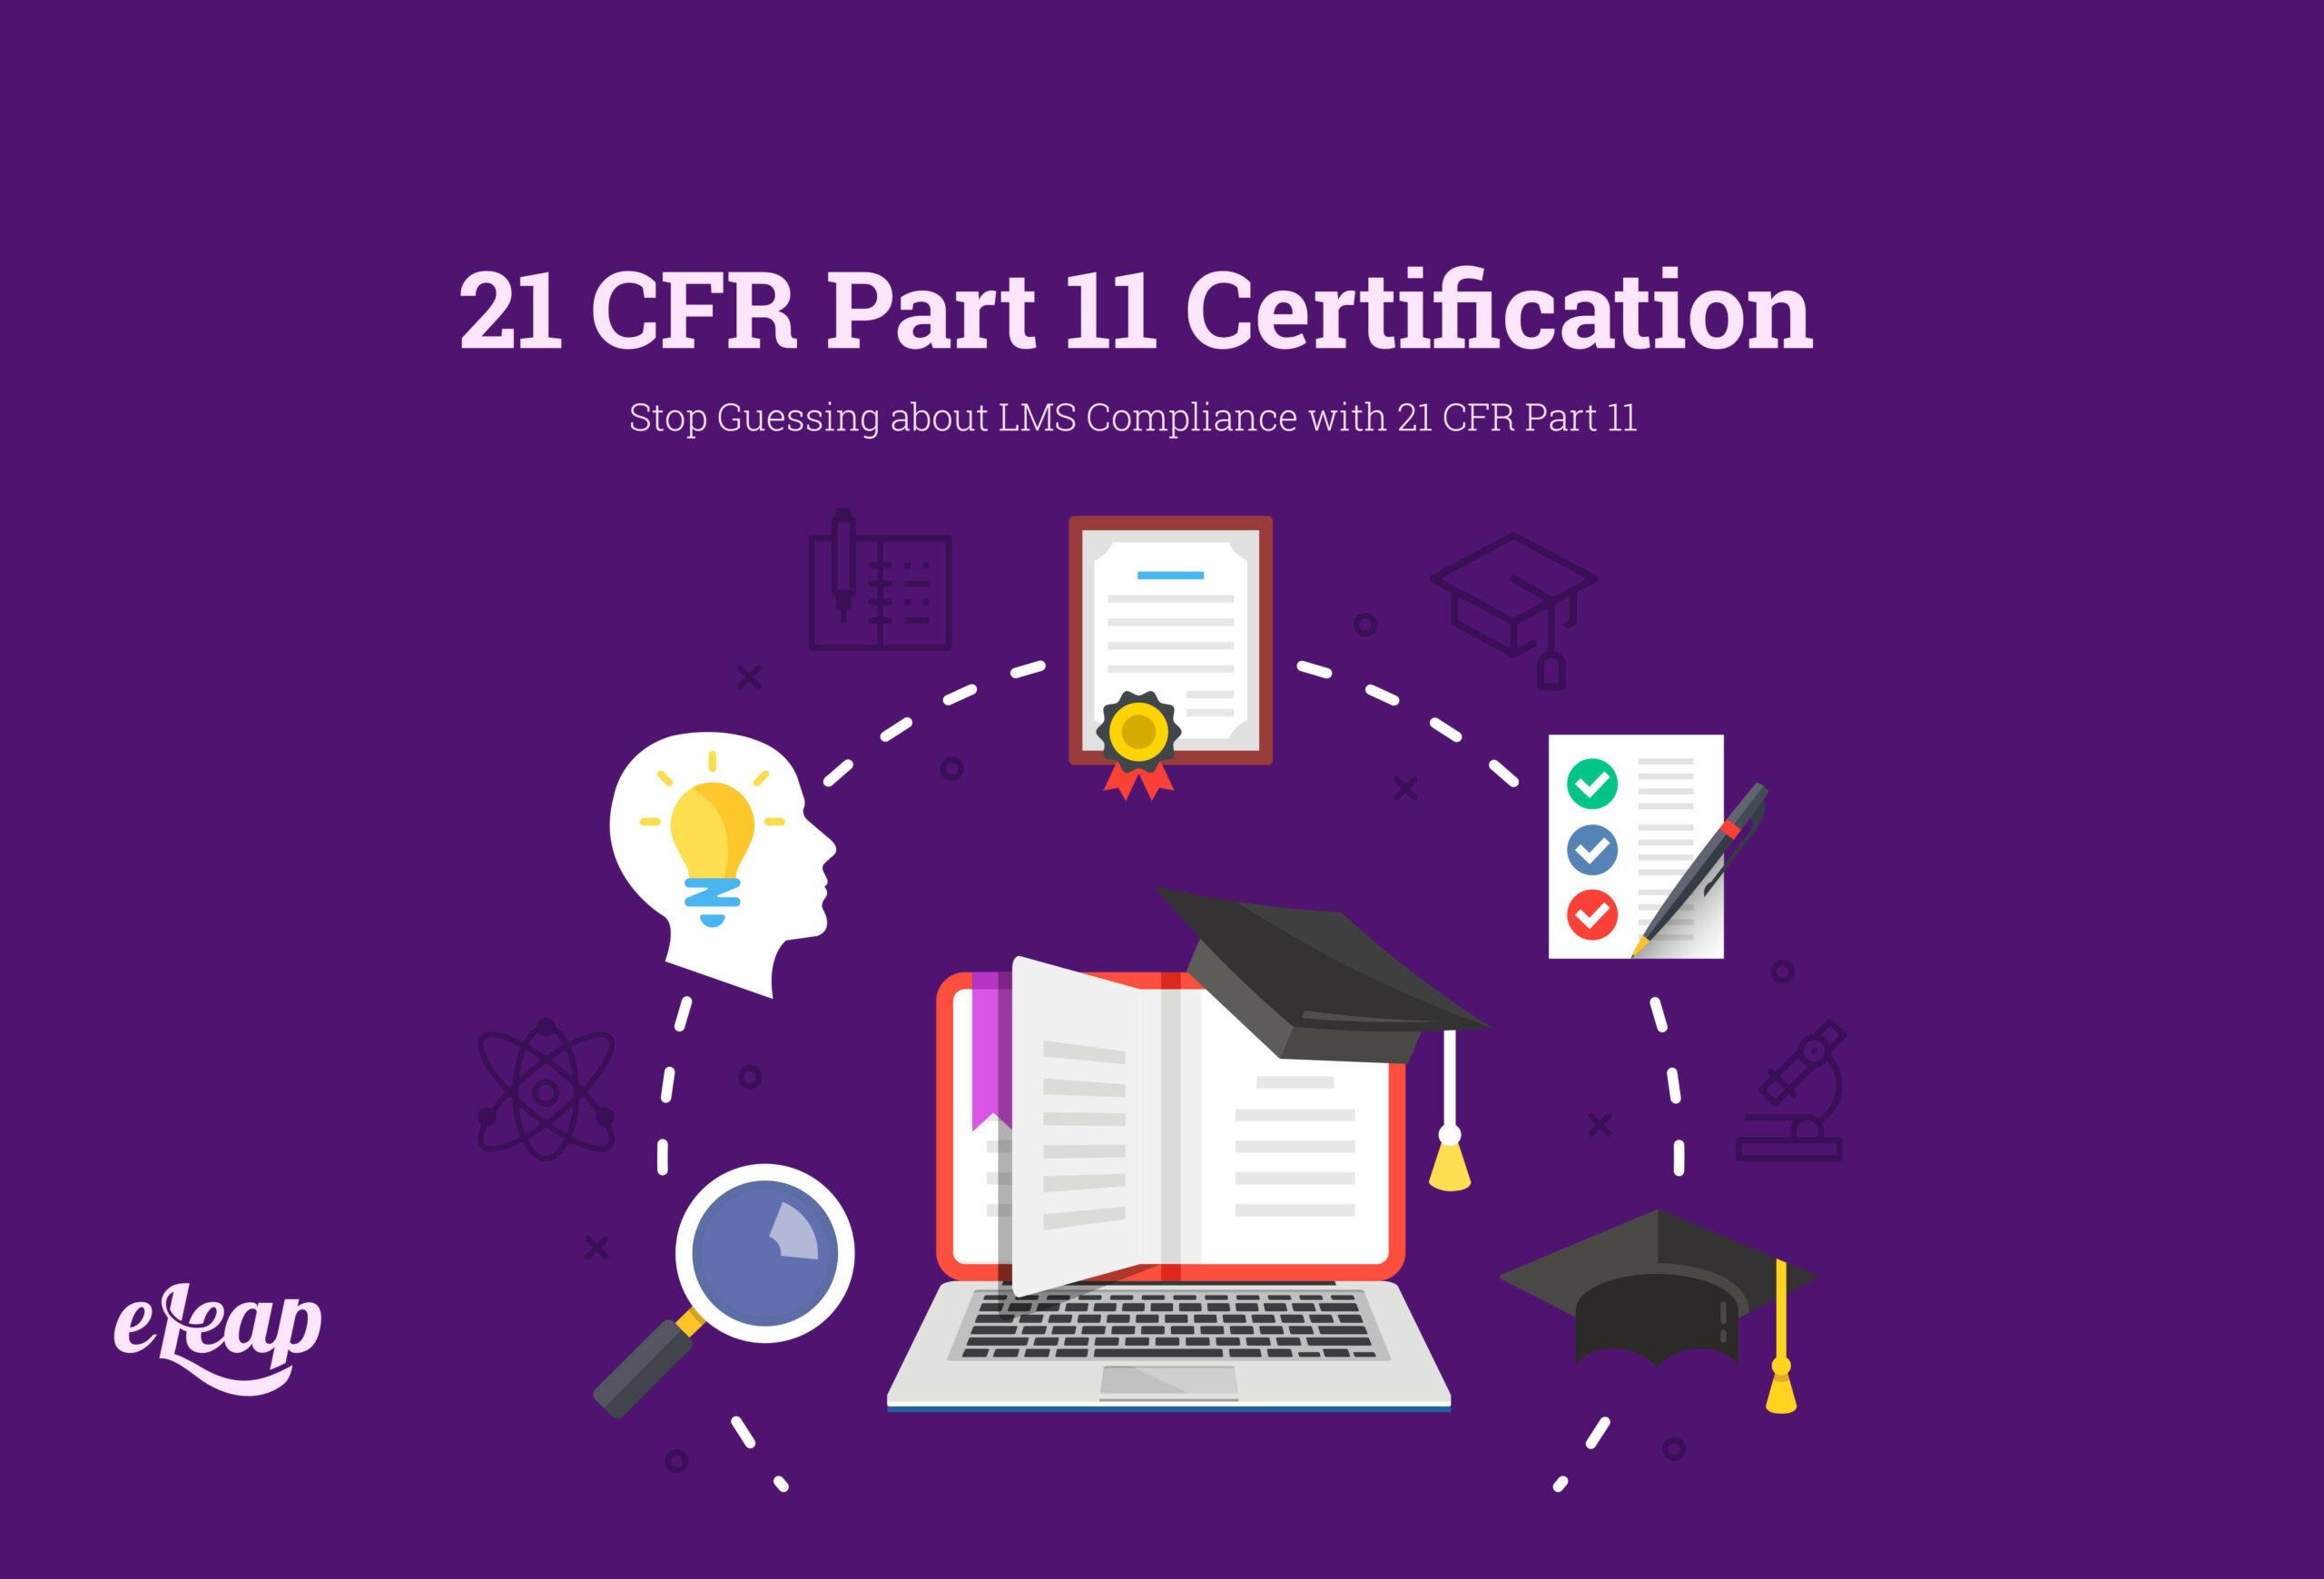 21 CFR Part 11 Certification